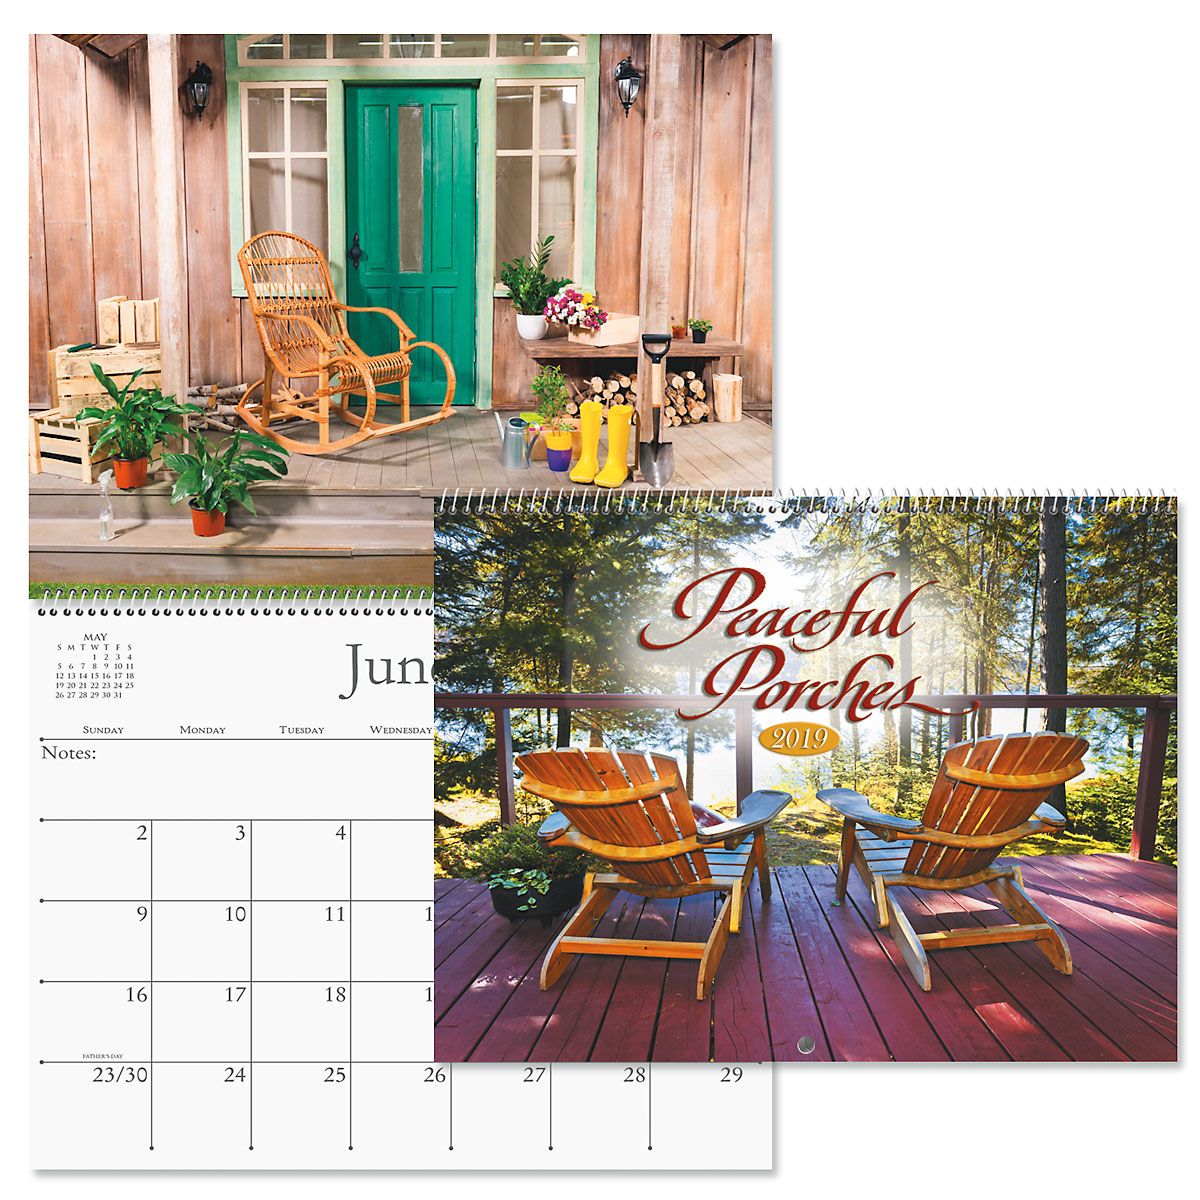 2019 Peaceful Porches Wall Calendar